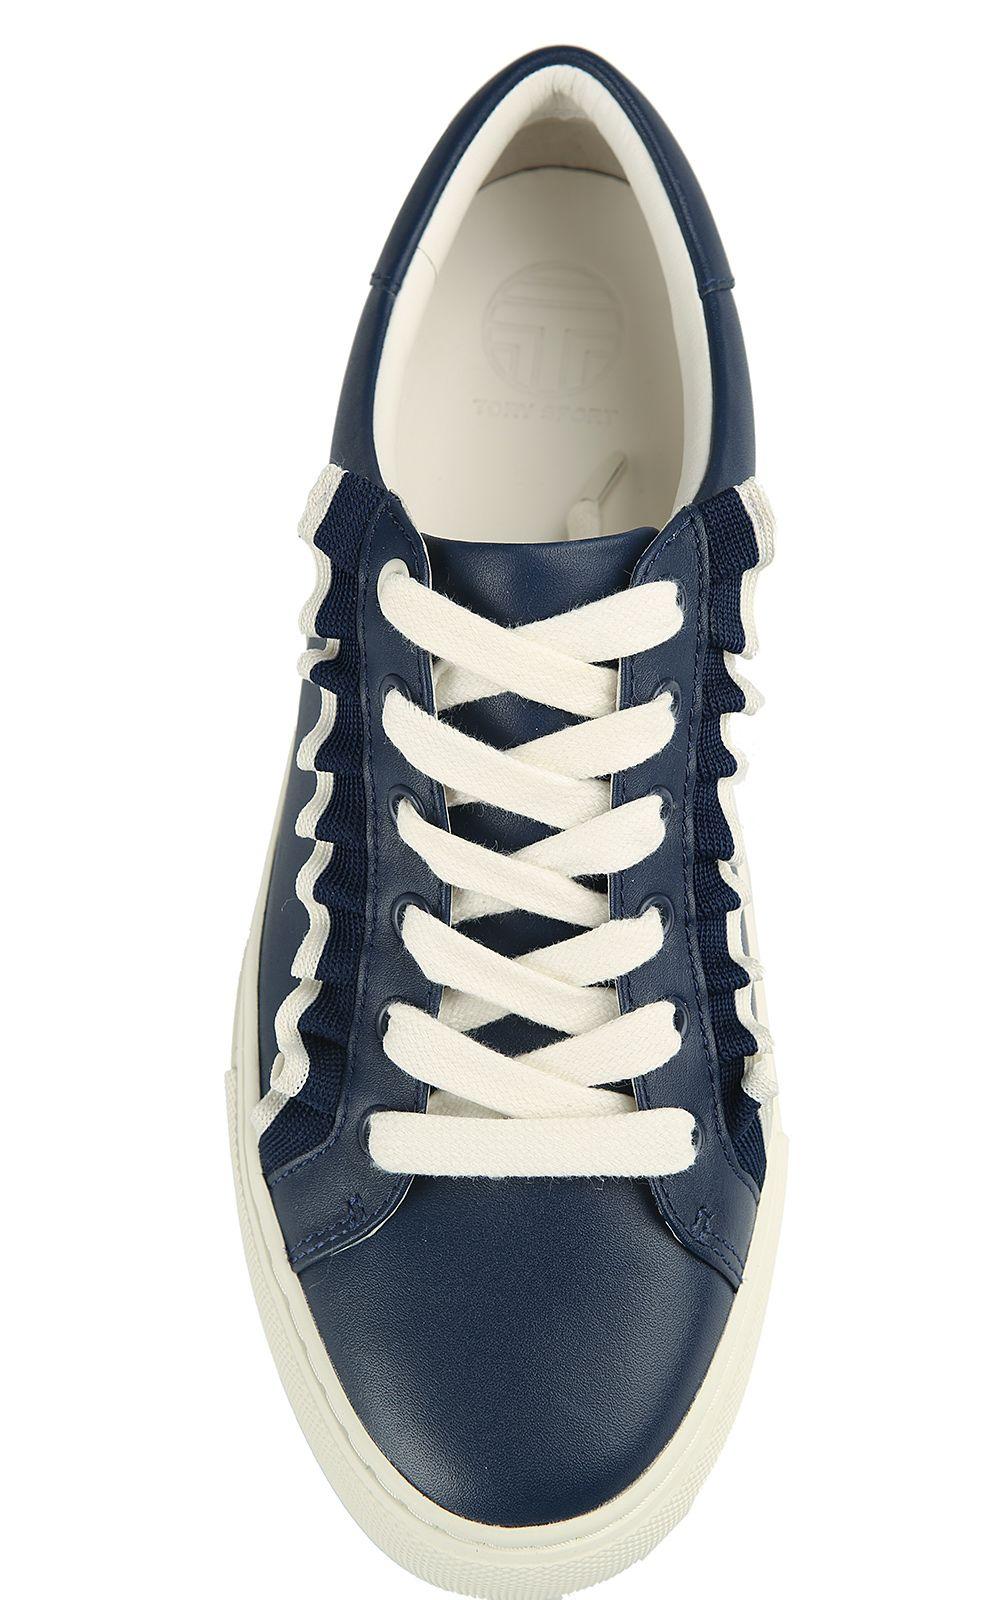 431845732e1c Tory Burch Tory Burch Tory Sport Ruffle-tim Leather Sneakers - Blu ...